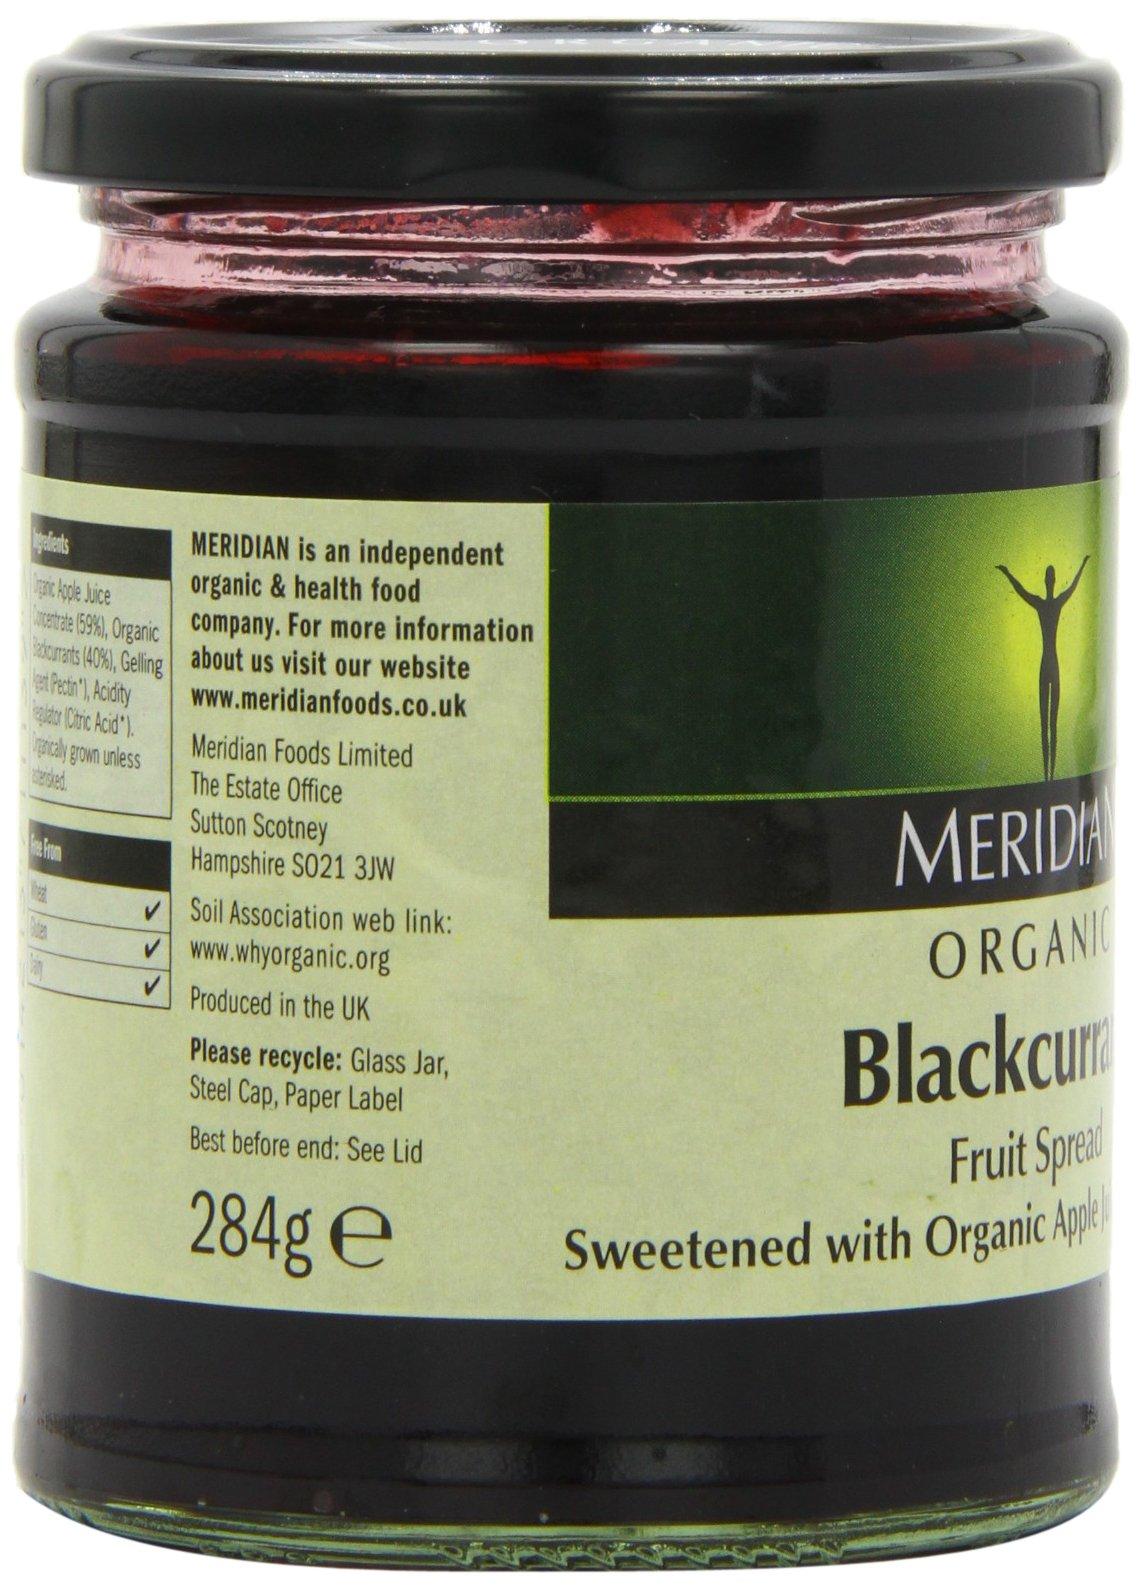 Meridian Organic Blackcurrant Fruit Spread 284 g (Pack of 6) by Meridian (Image #7)